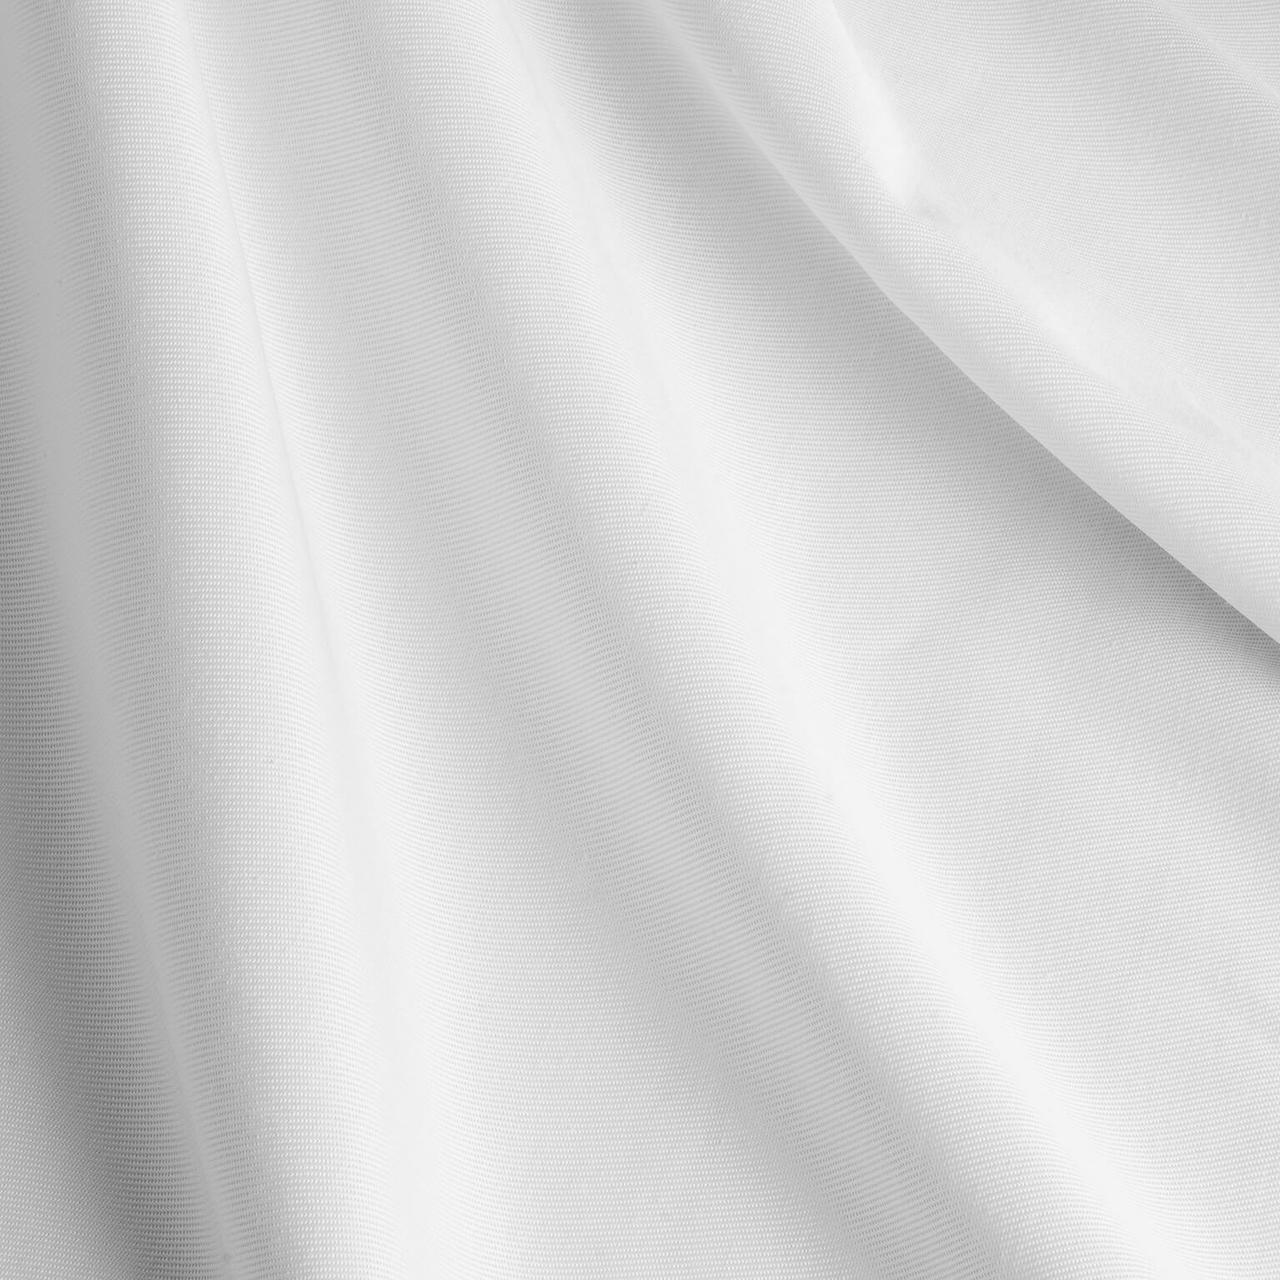 Ткань для скатертей и салфеток (ресторан) 81542v5